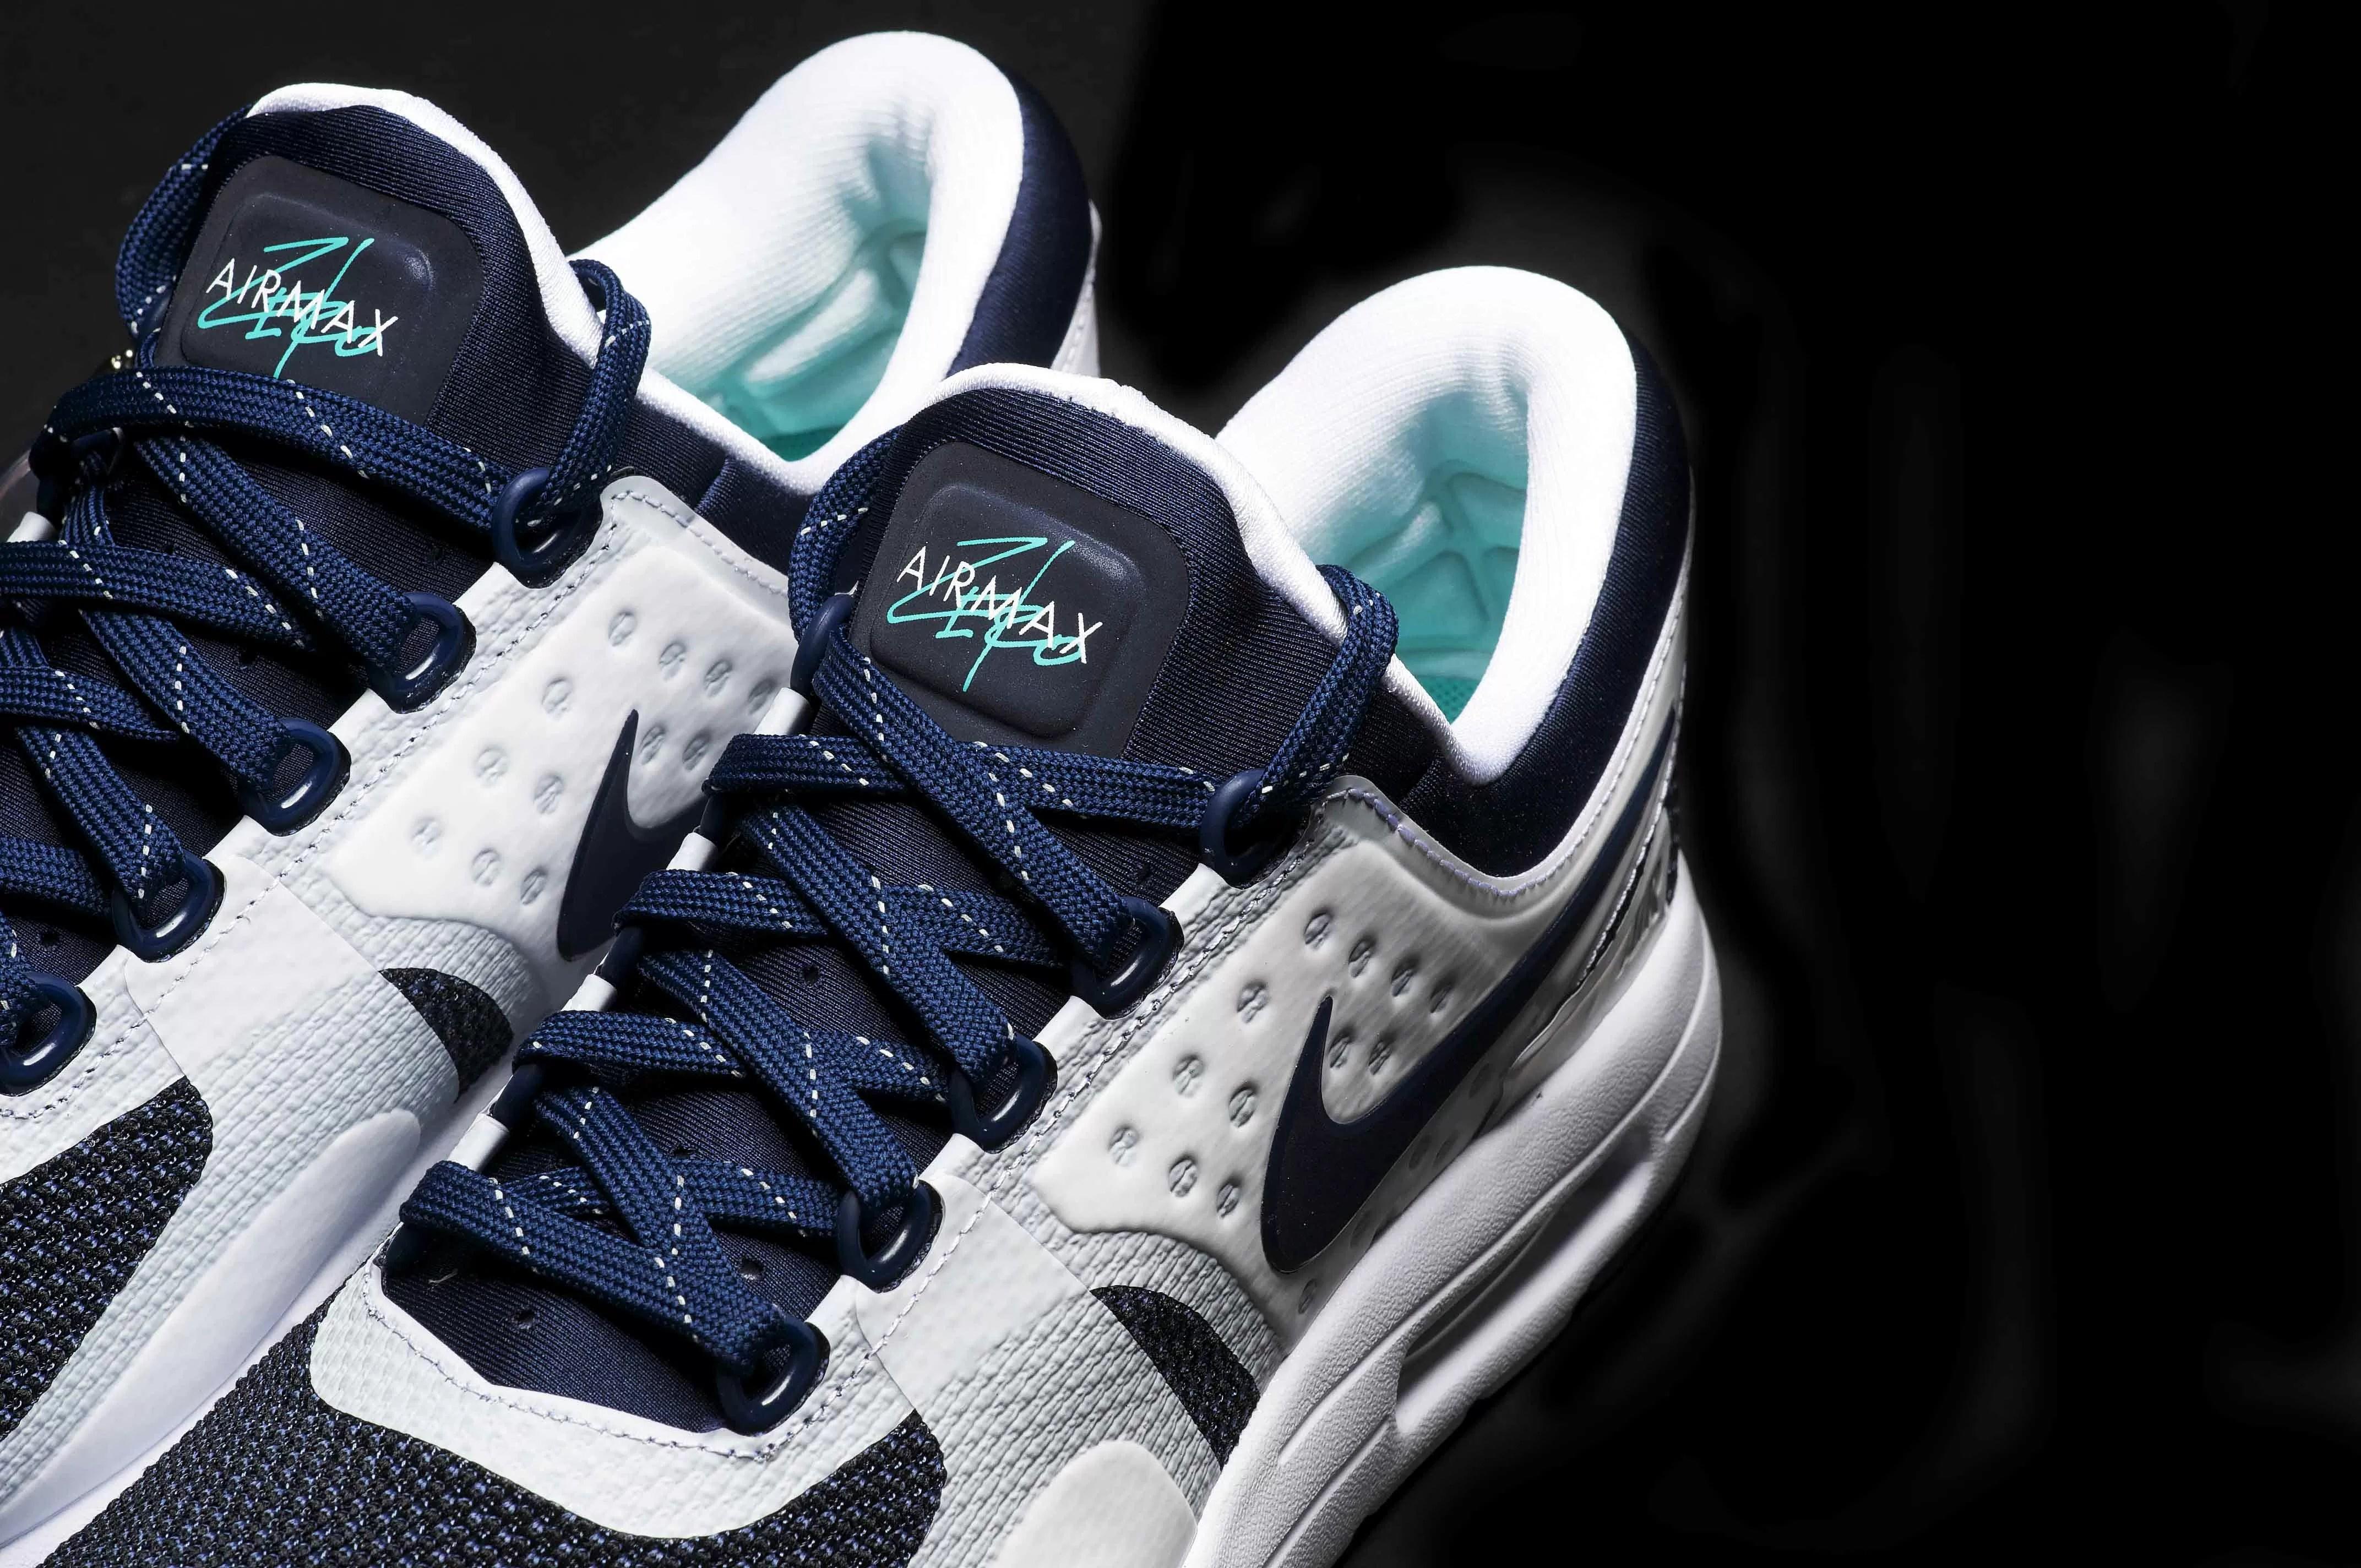 AirMaxDay: Nike's Very Own